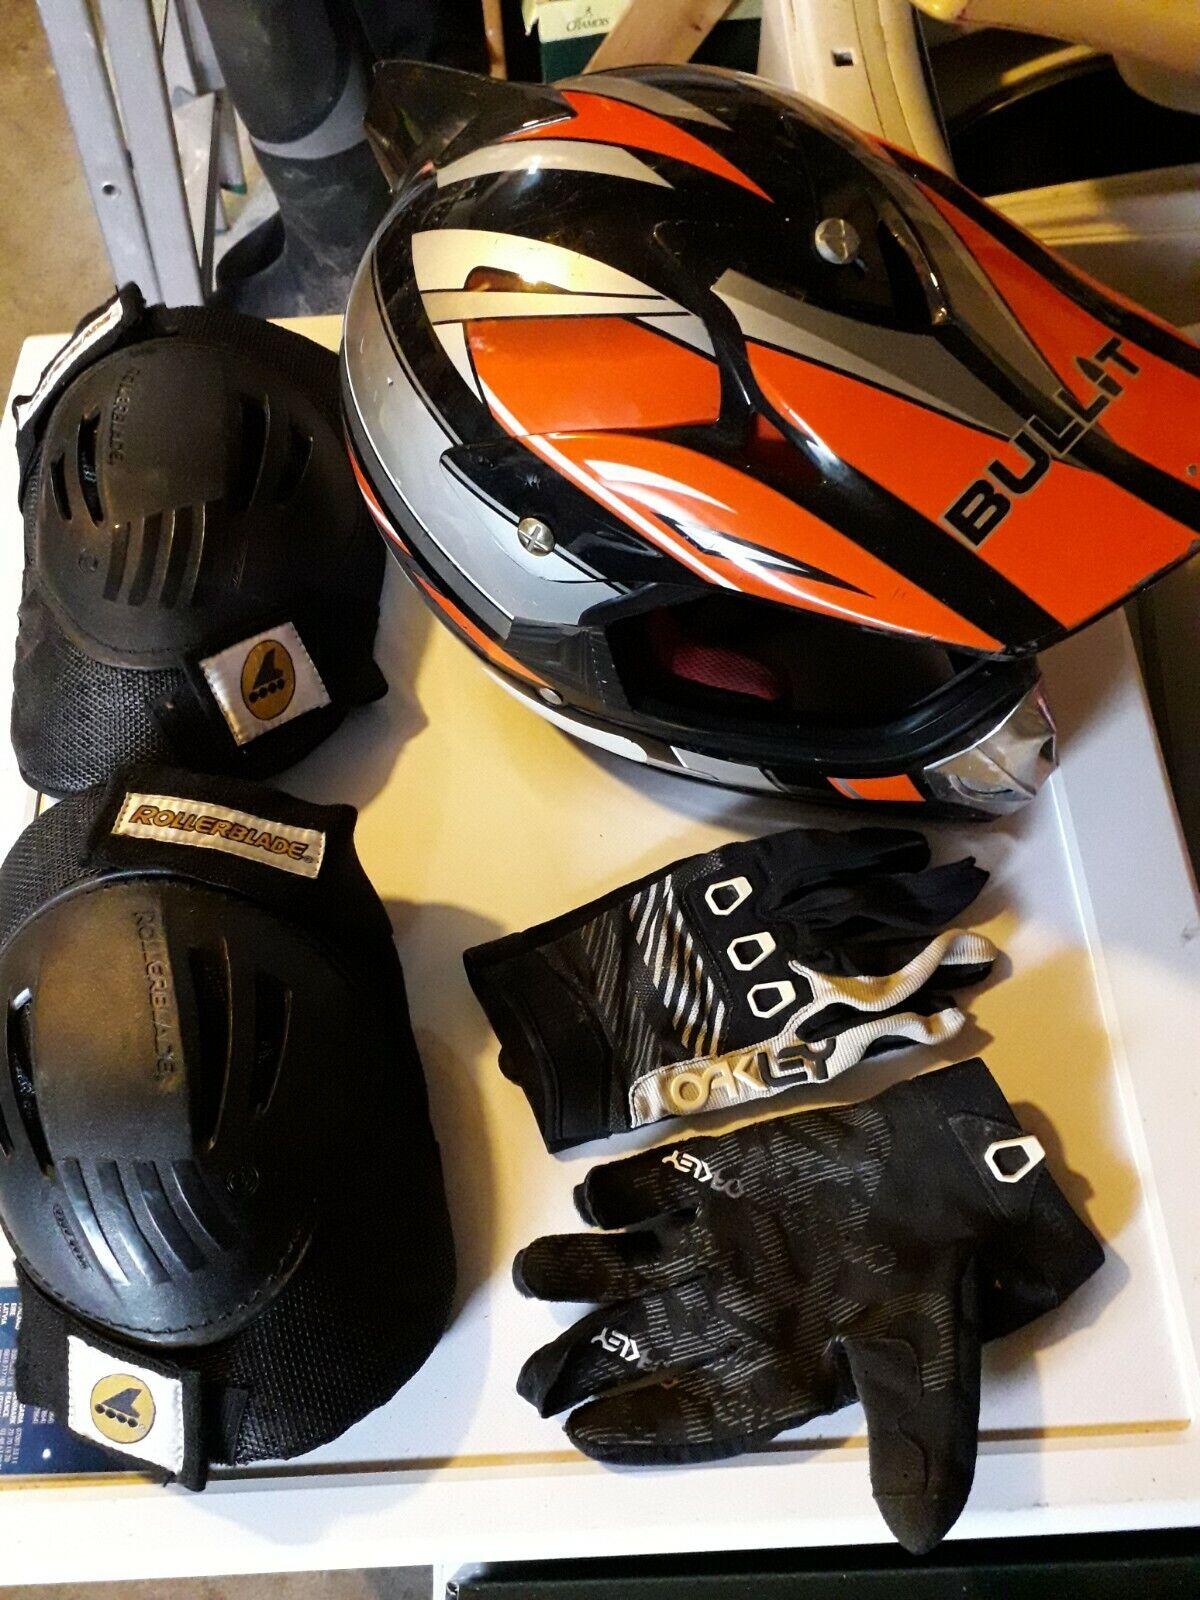 Casque moto cross bullit taille s + protections genou rollerblade + gants oakley